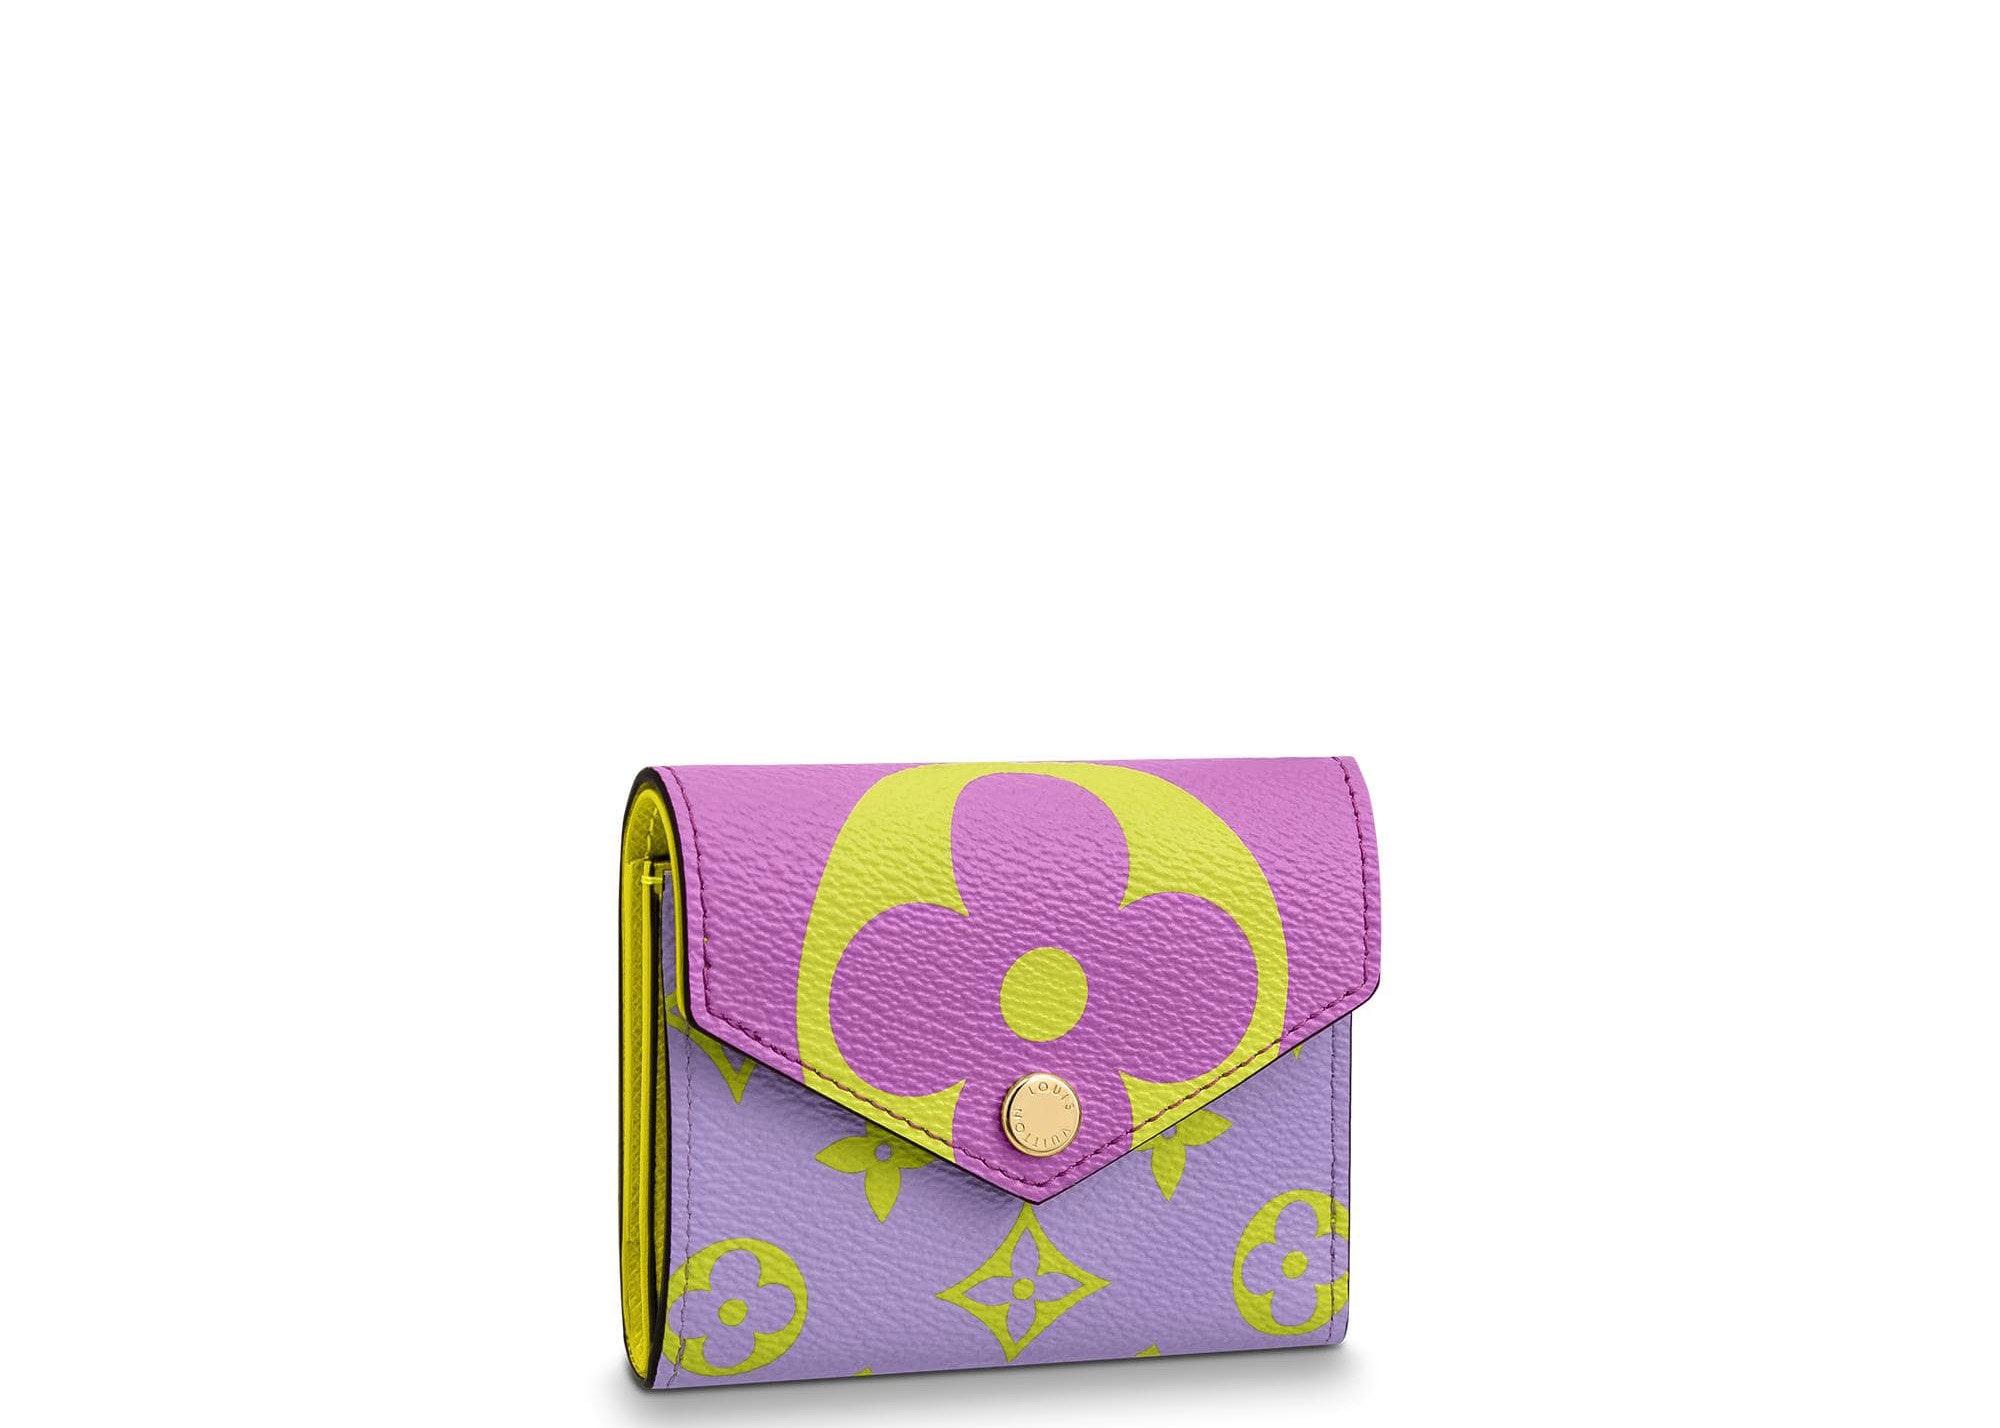 Louis Vuitton Zoe Wallet Monogram Giant Pink/Lilac